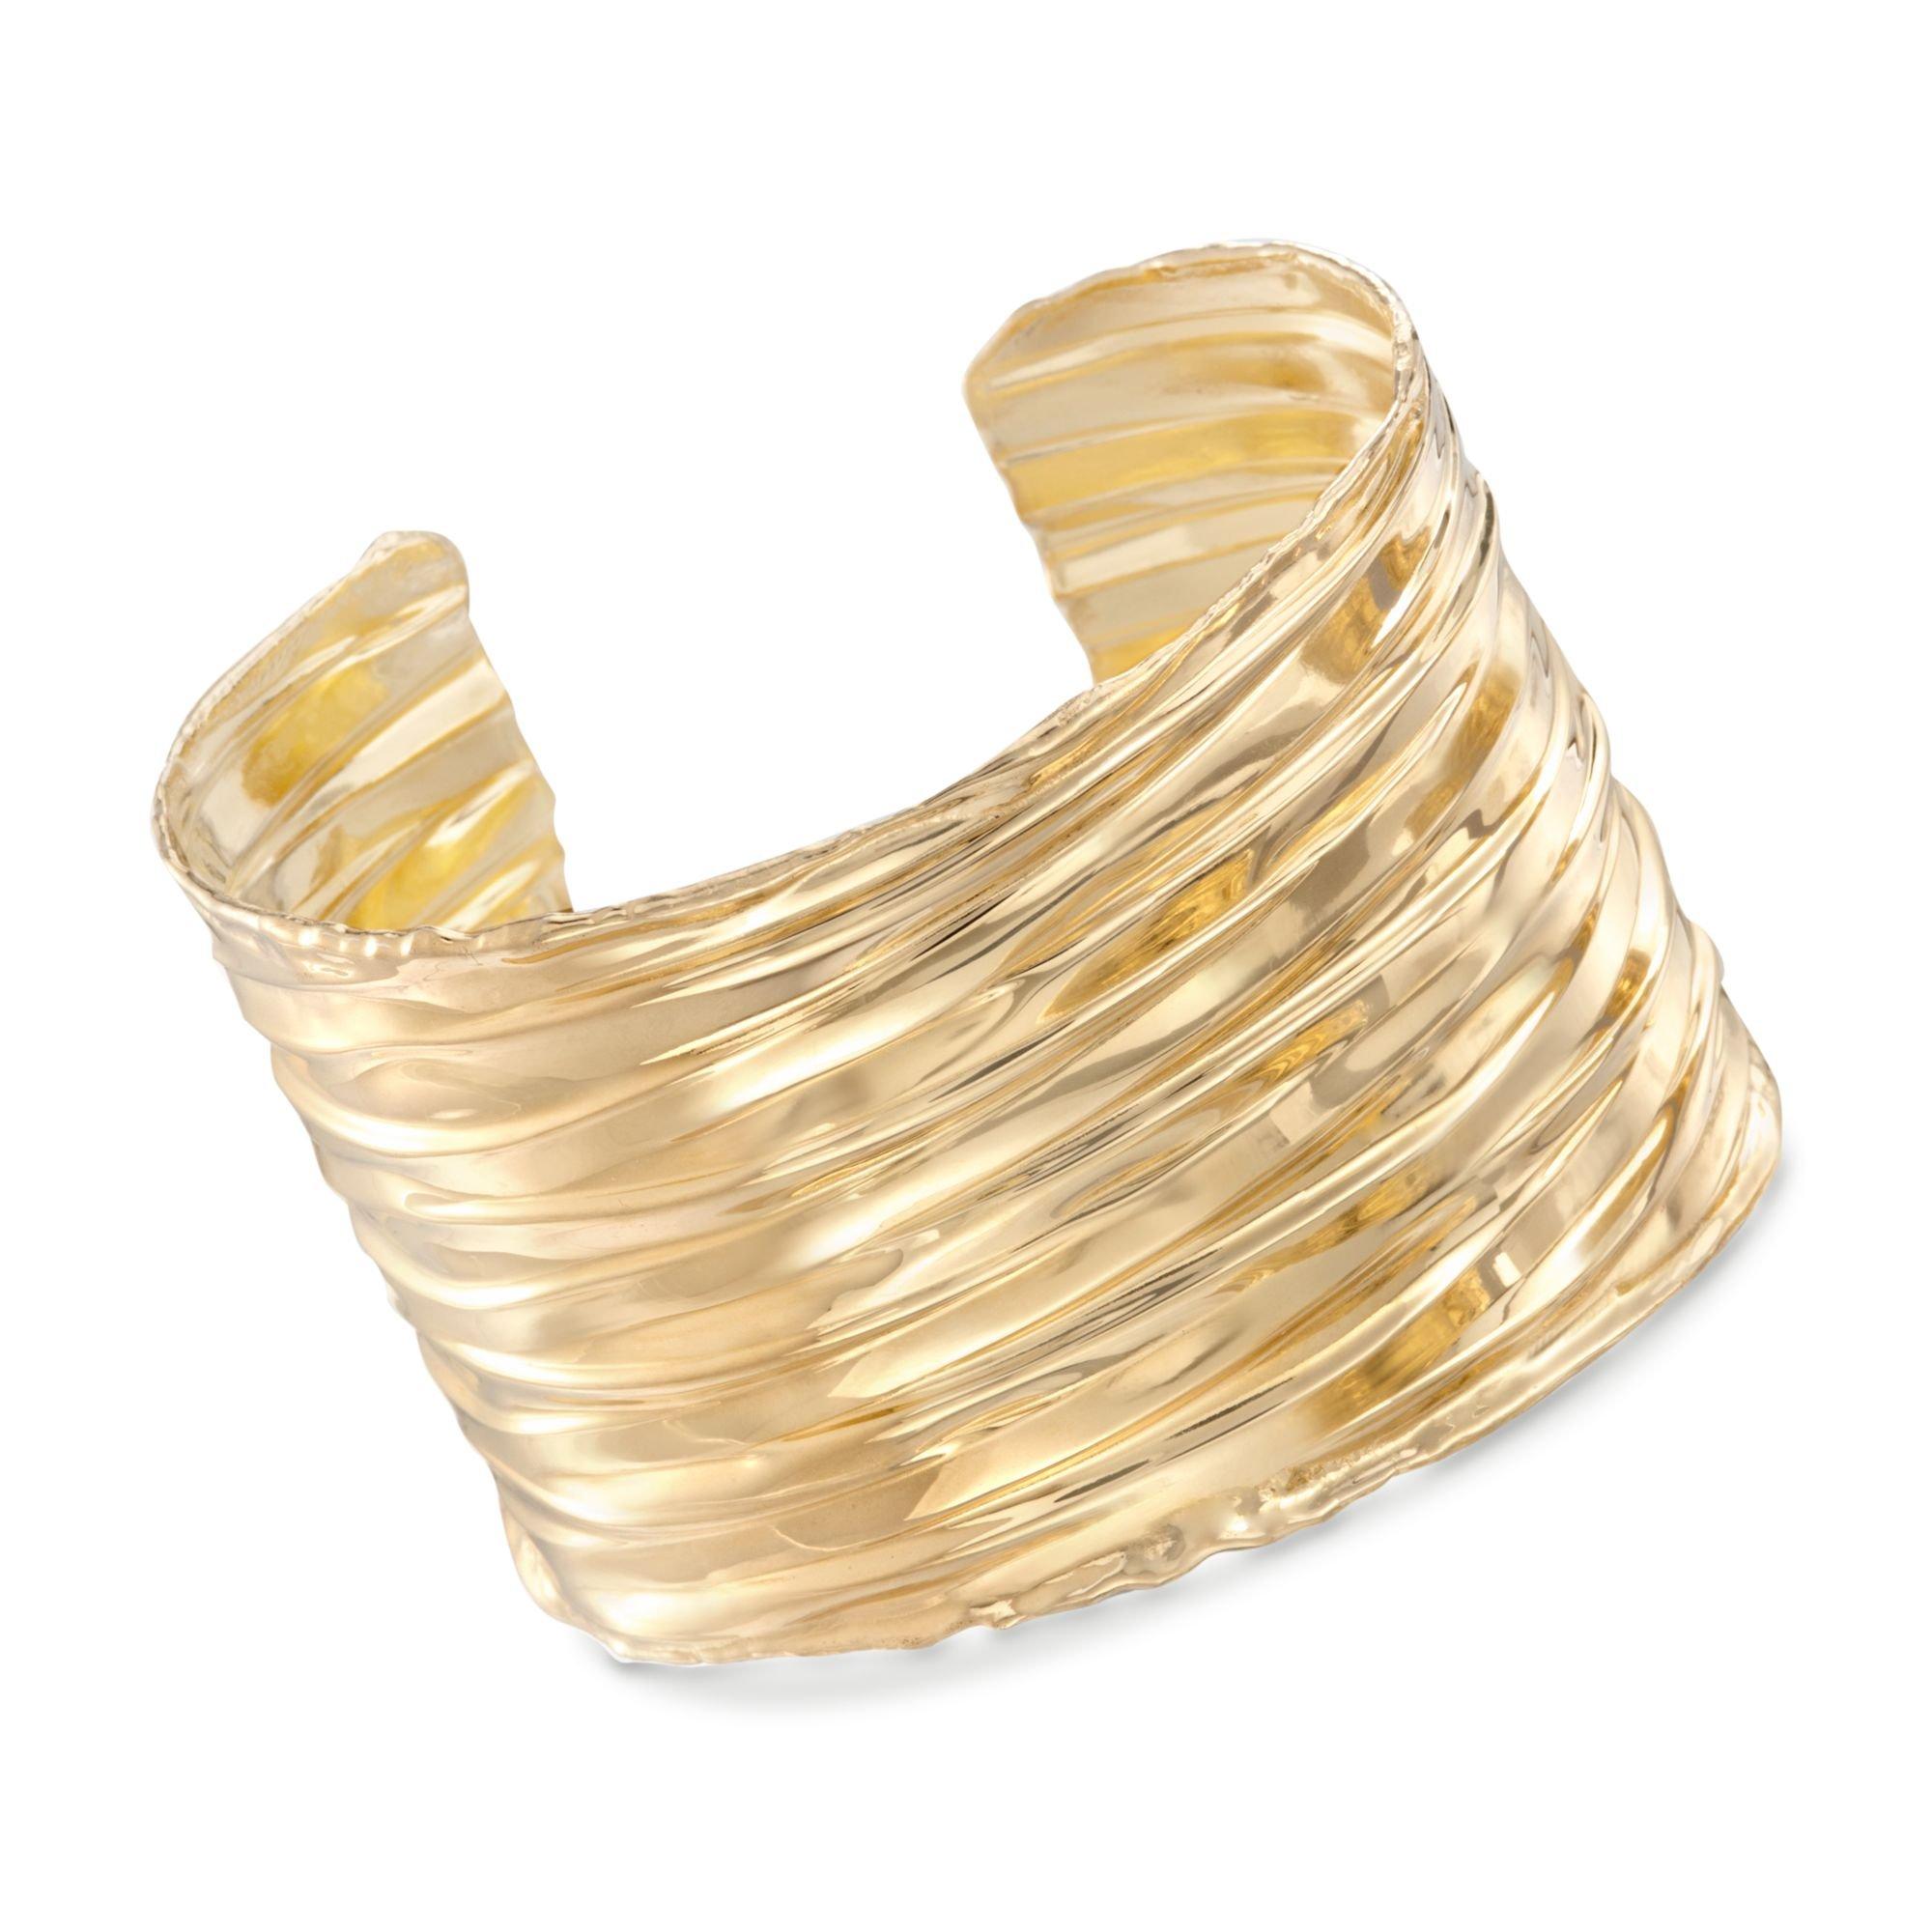 Ross-Simons Italian 24kt Yellow Gold Over Sterling Silver Rippled Cuff Bracelet